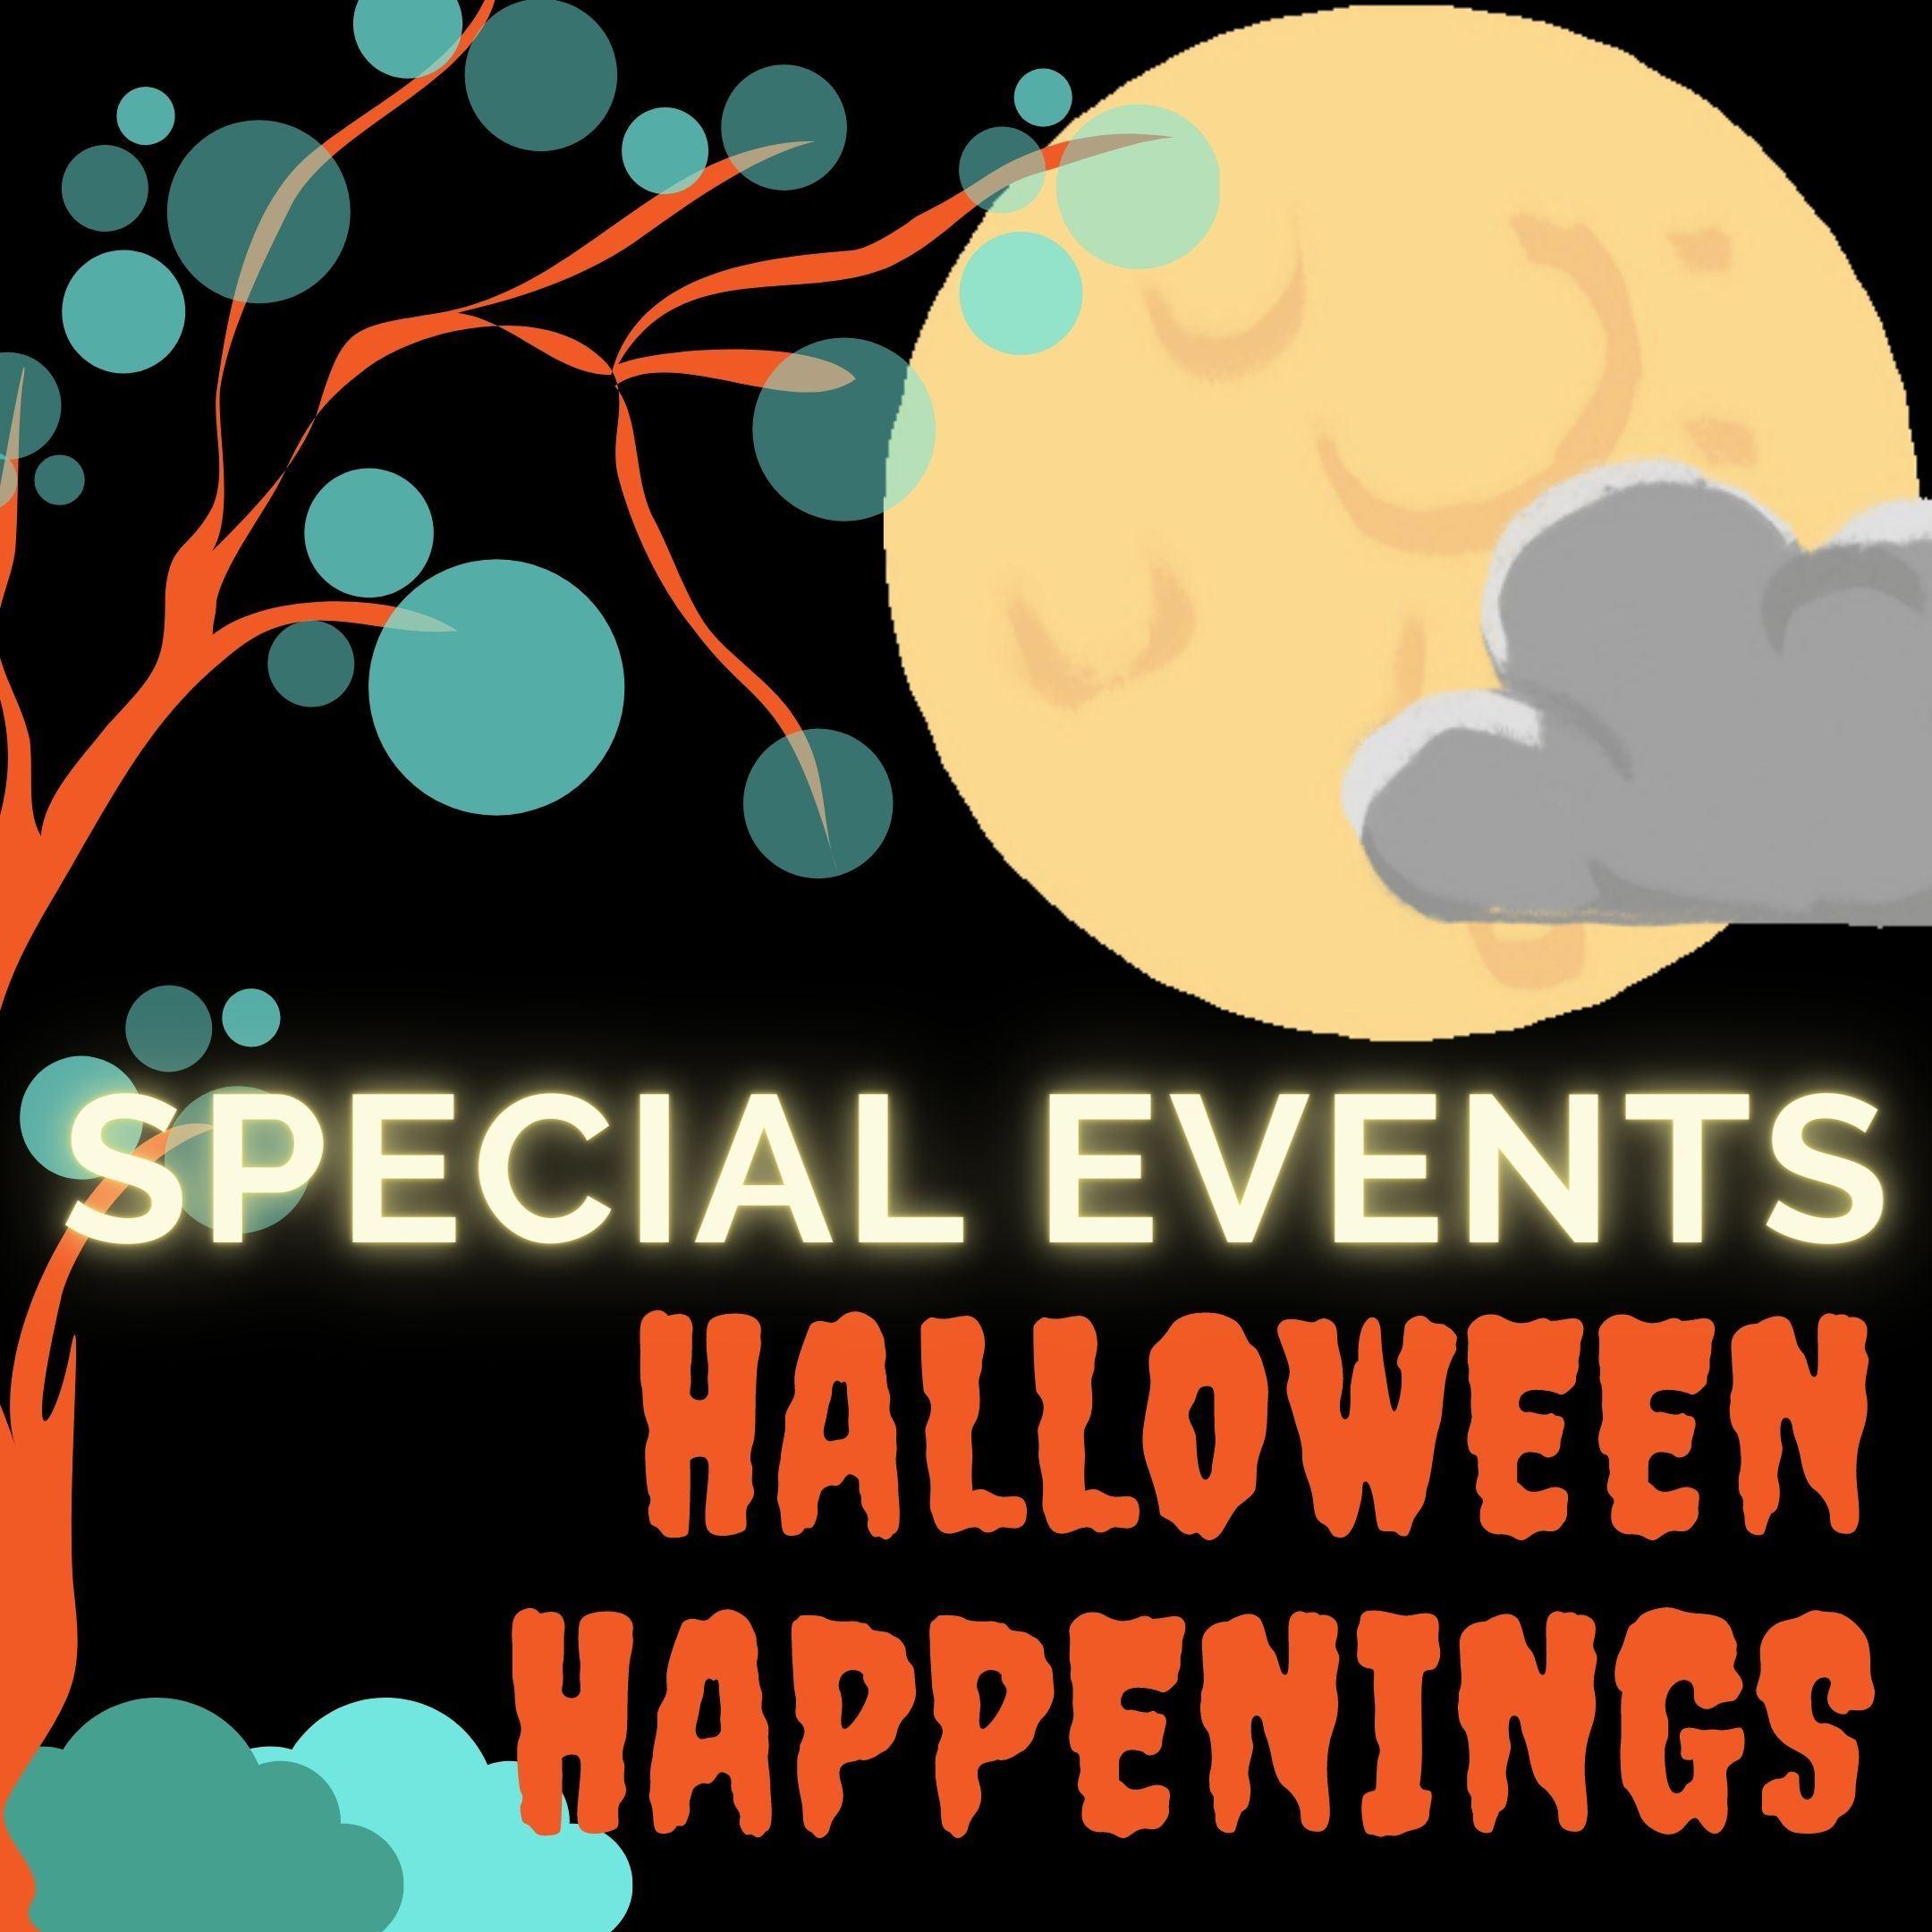 halloween happenings special events